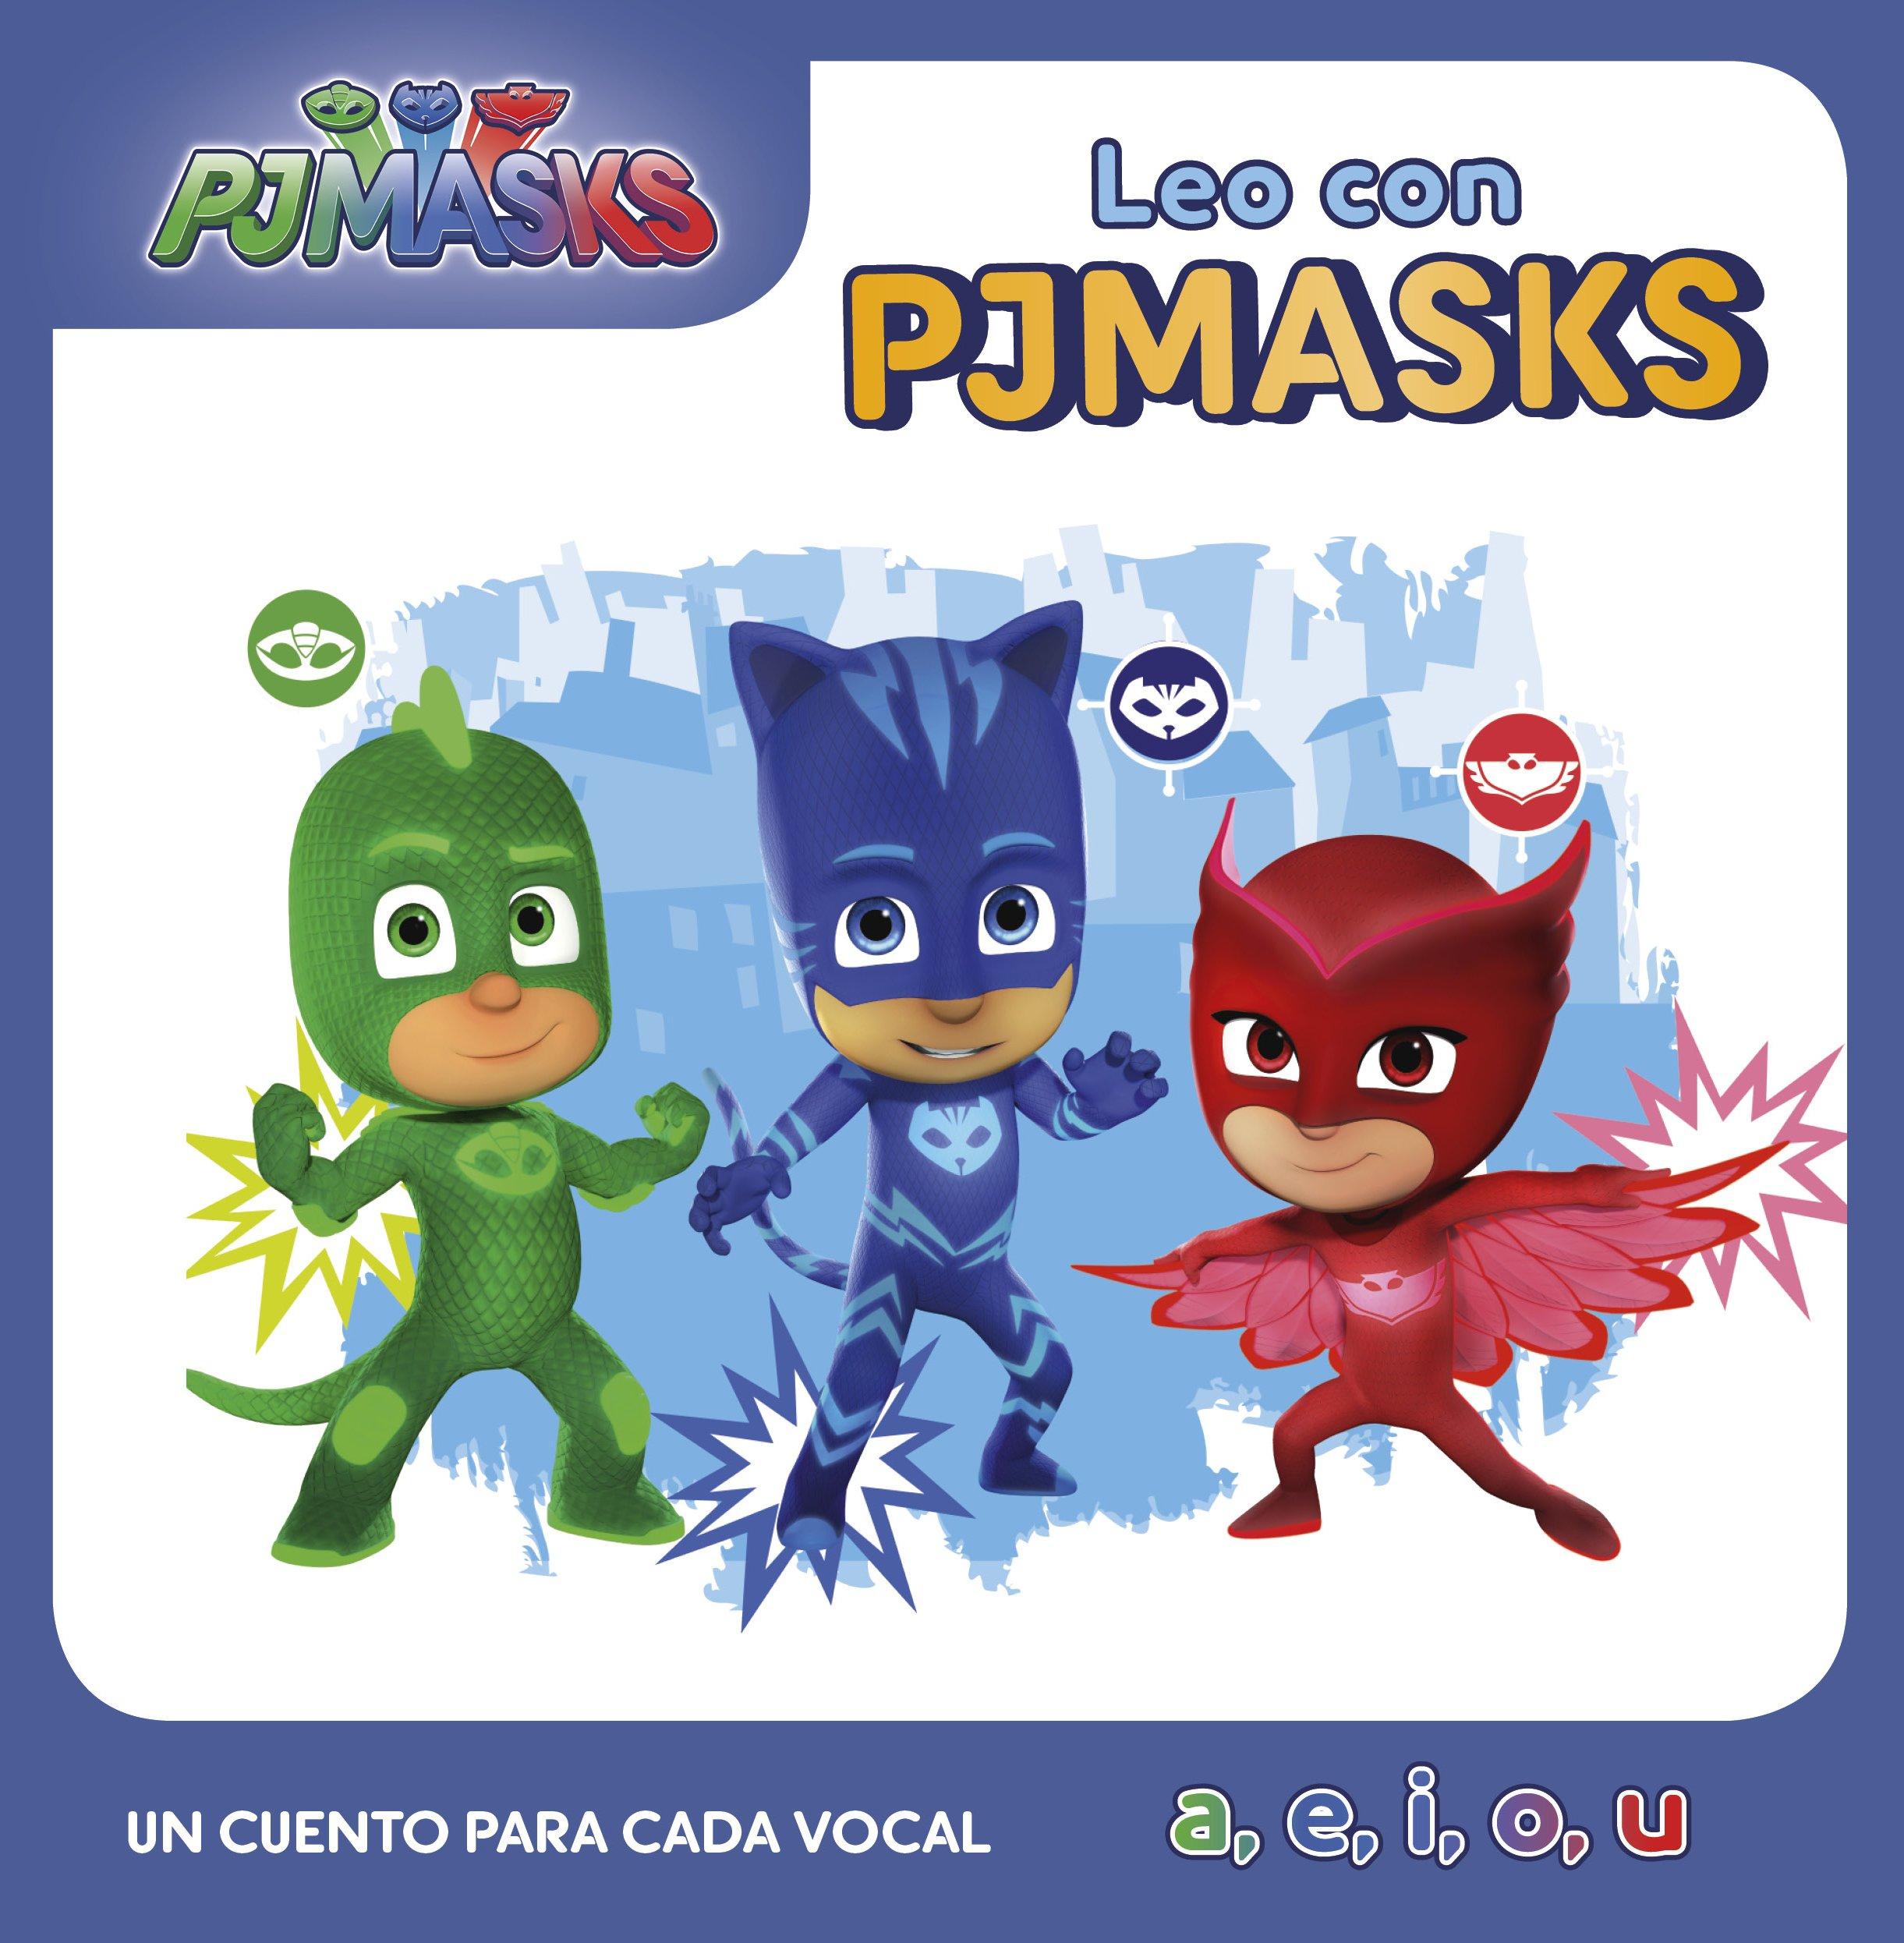 Un cuento para cada vocal: a, e, i, o, u (Leo con PJ Masks ...